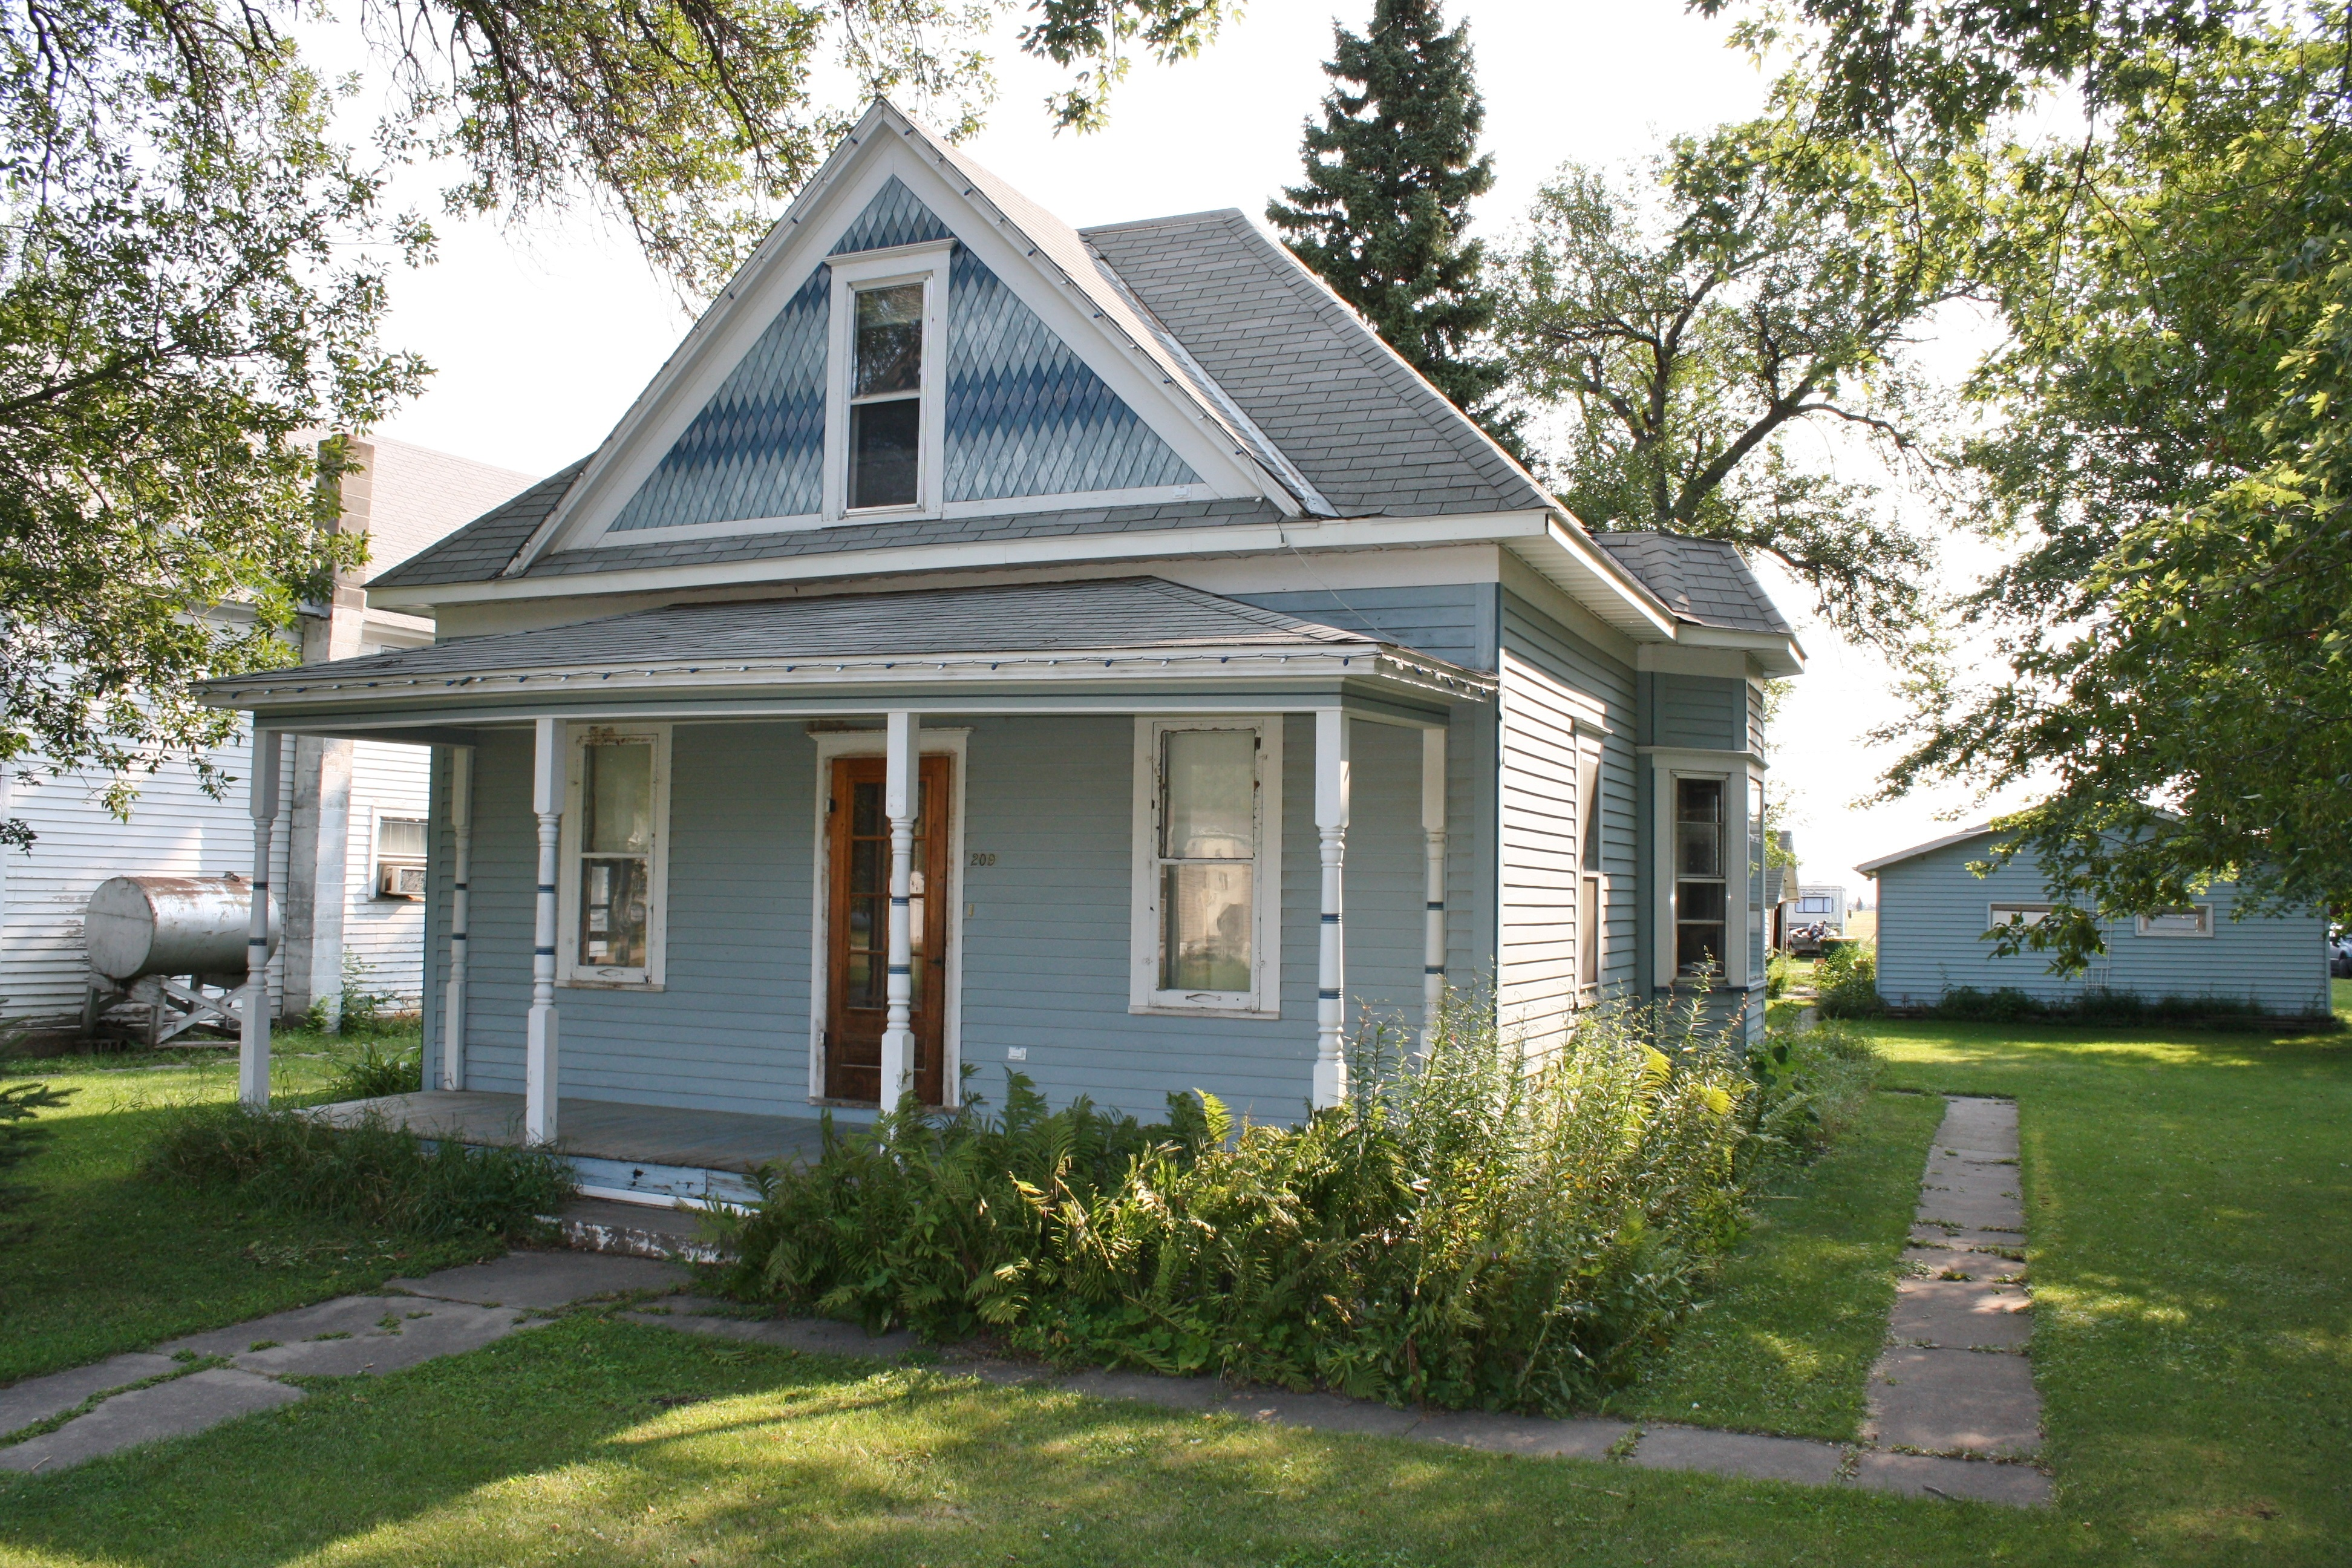 209 Prospect Ave, Gilby, North Dakota 58235